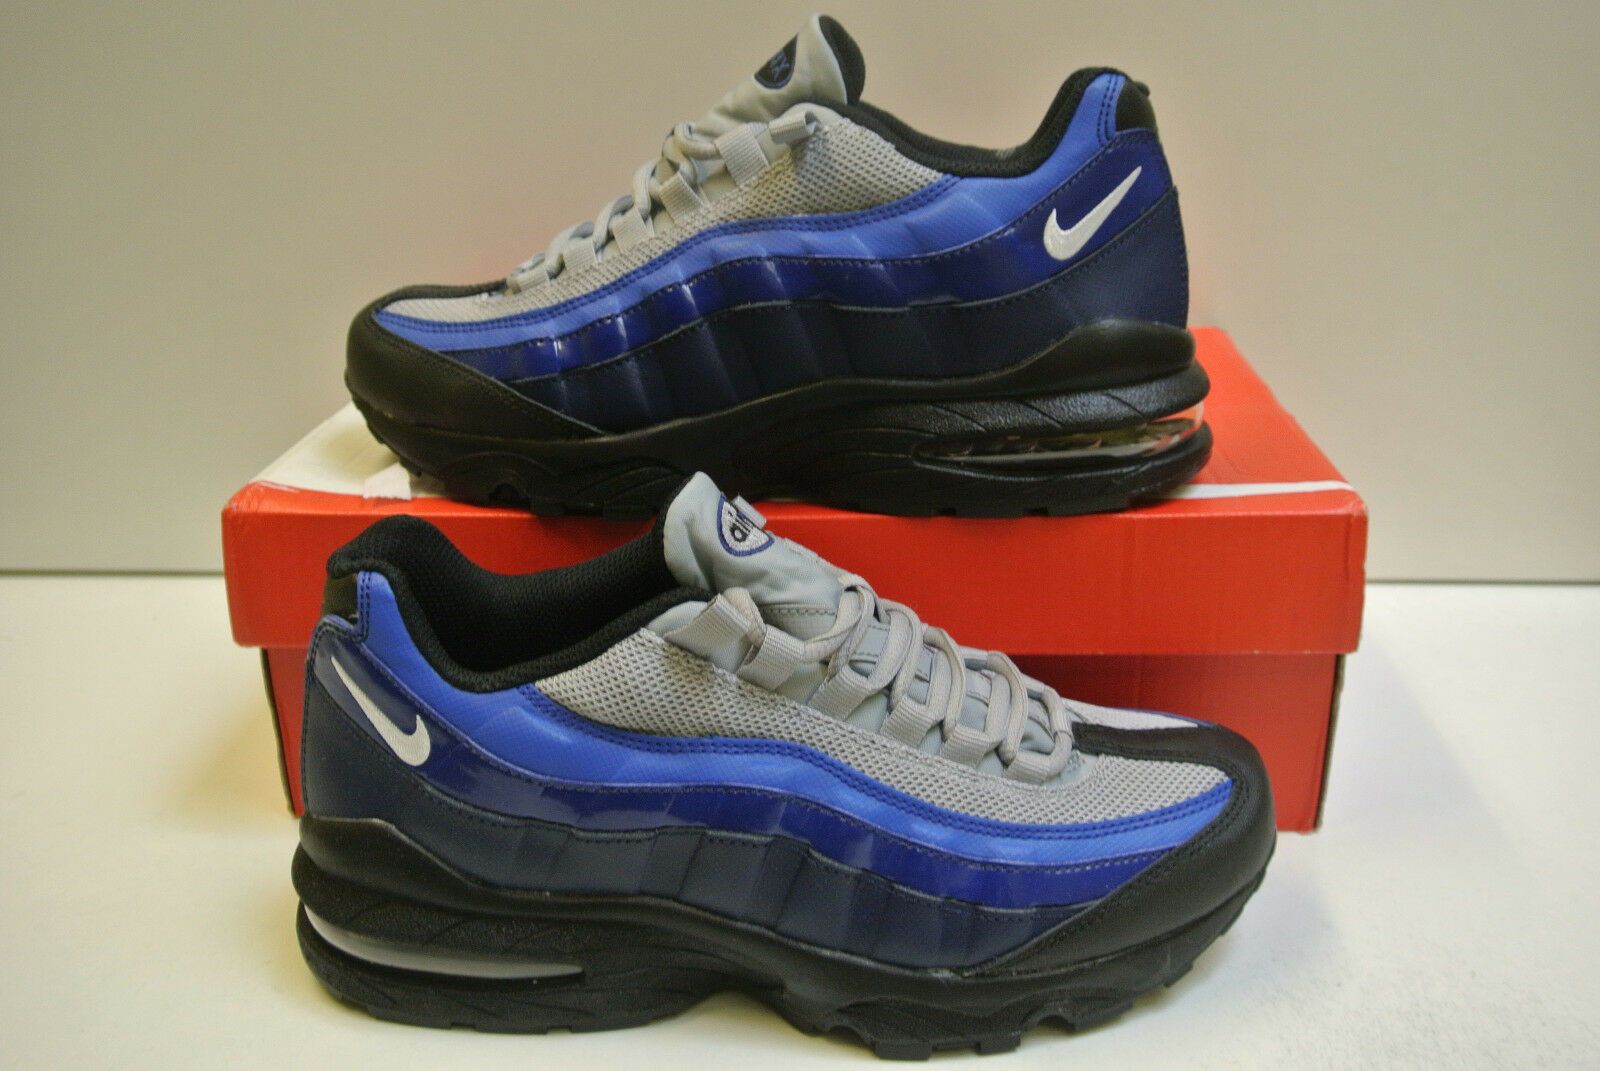 Nike Air Max 95 TALLA A ELEGIR NUEVO Y EMB. orig. 905348 006